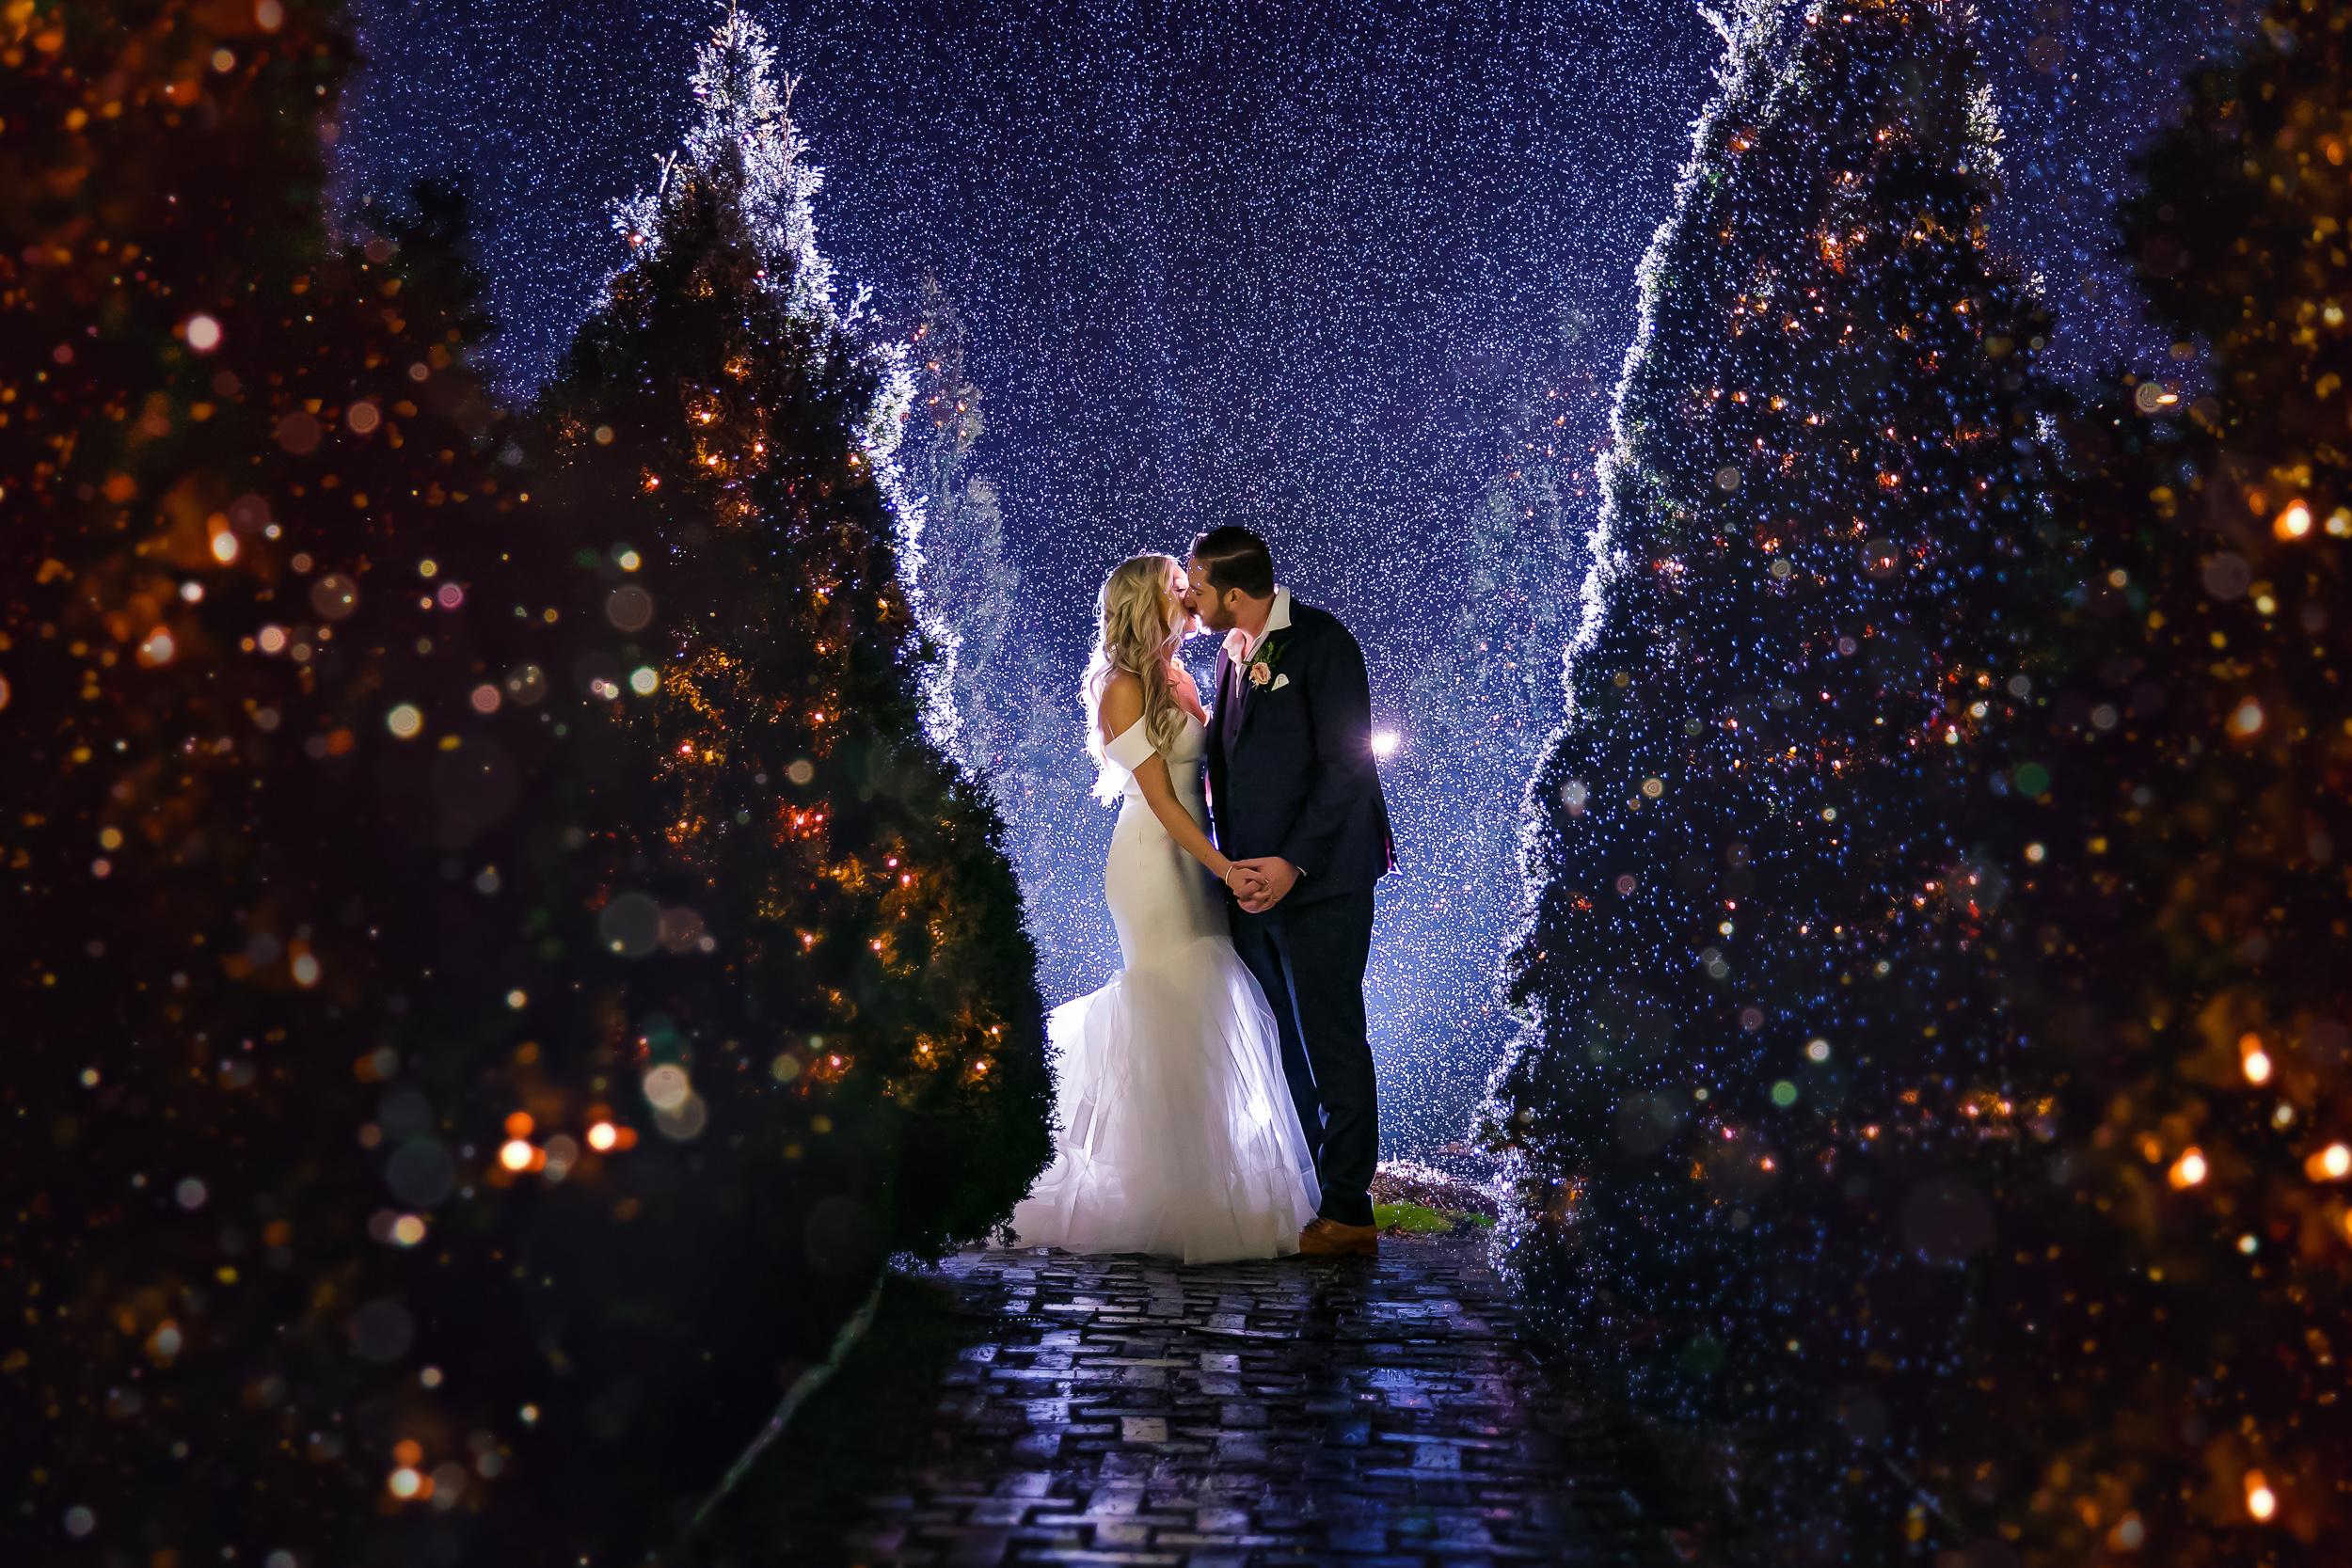 Michelle & Matt's New Year's Eve Wedding at Hacienda Sarria